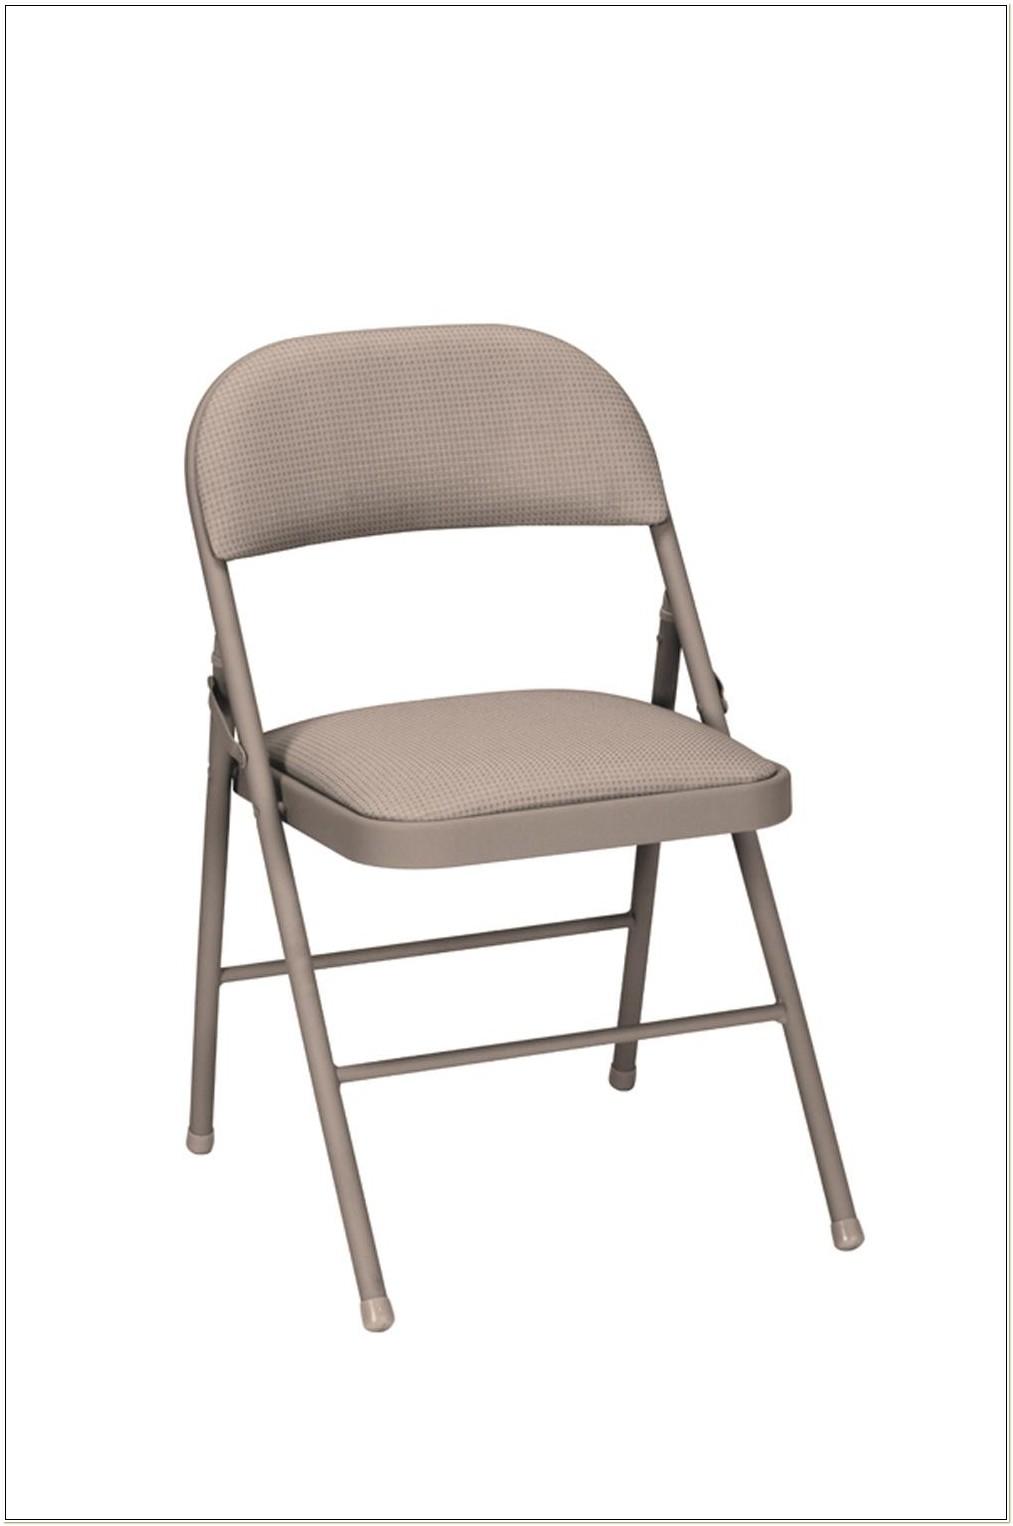 Cosco Fabric Folding Chair Antique Linen